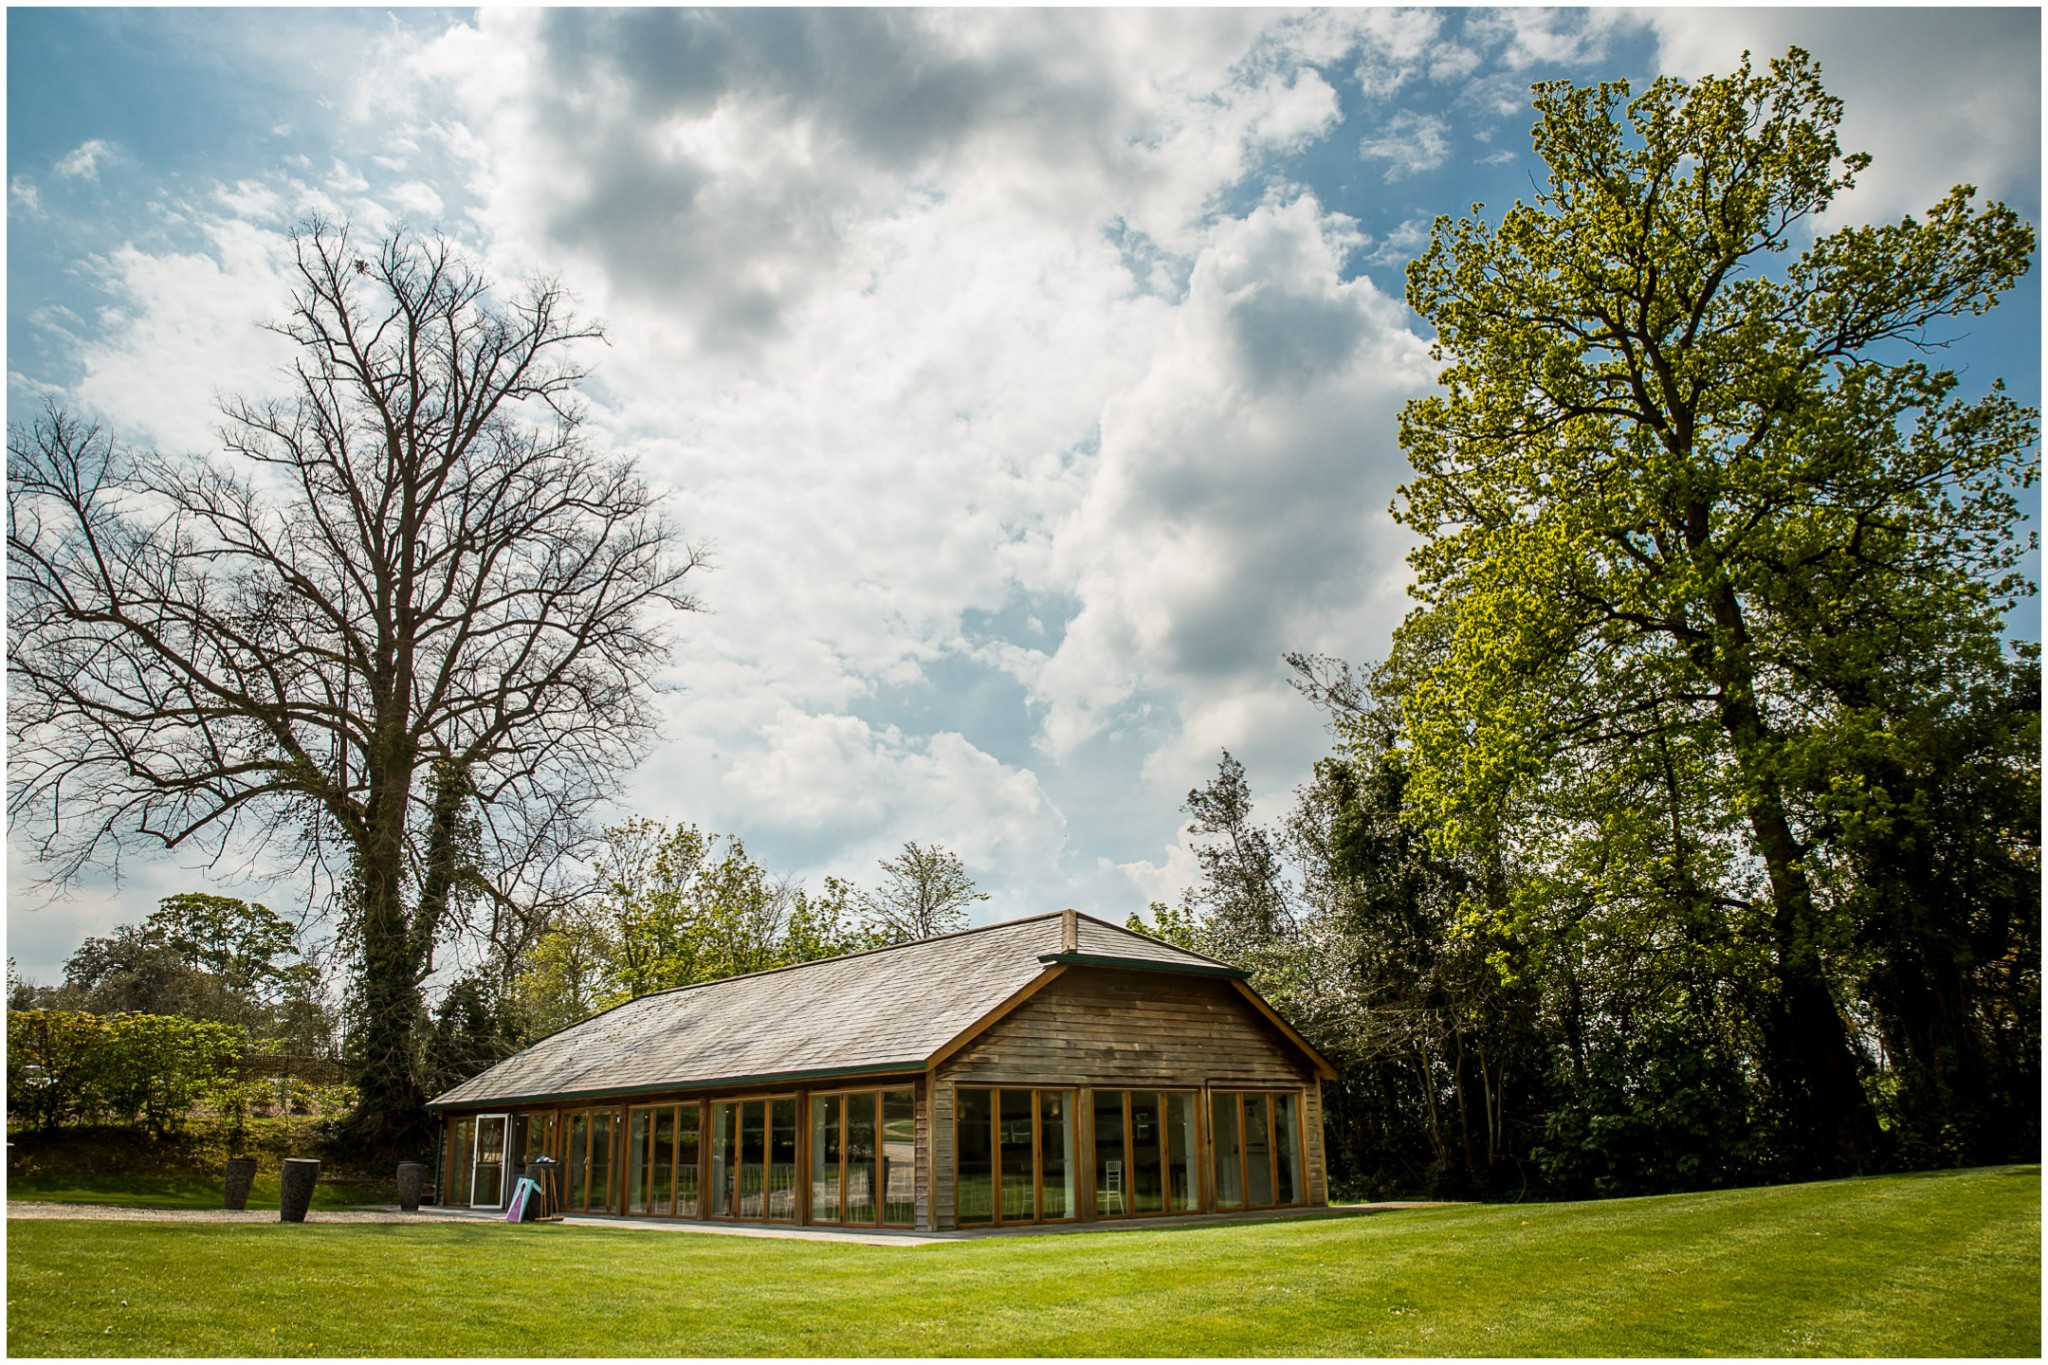 Wasing Park Wedding Photography Barn exterior